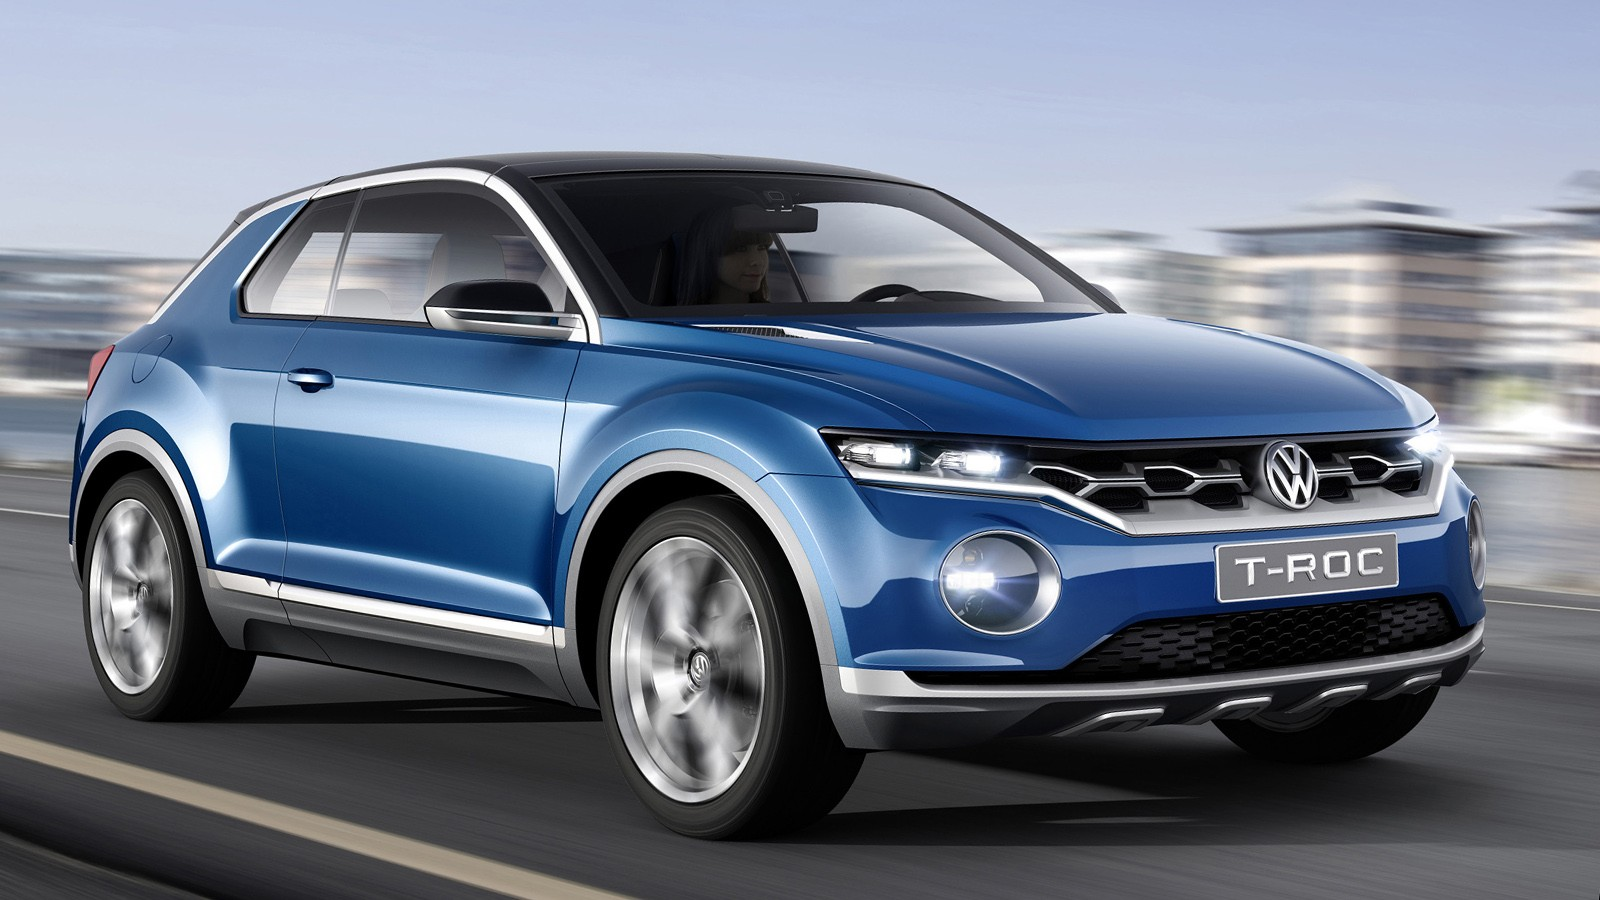 На фото: концепт VW T-Roc 2014 года. Не исключено, что серийная версия будет ближе к другому прототипу — T-Cross Breeze